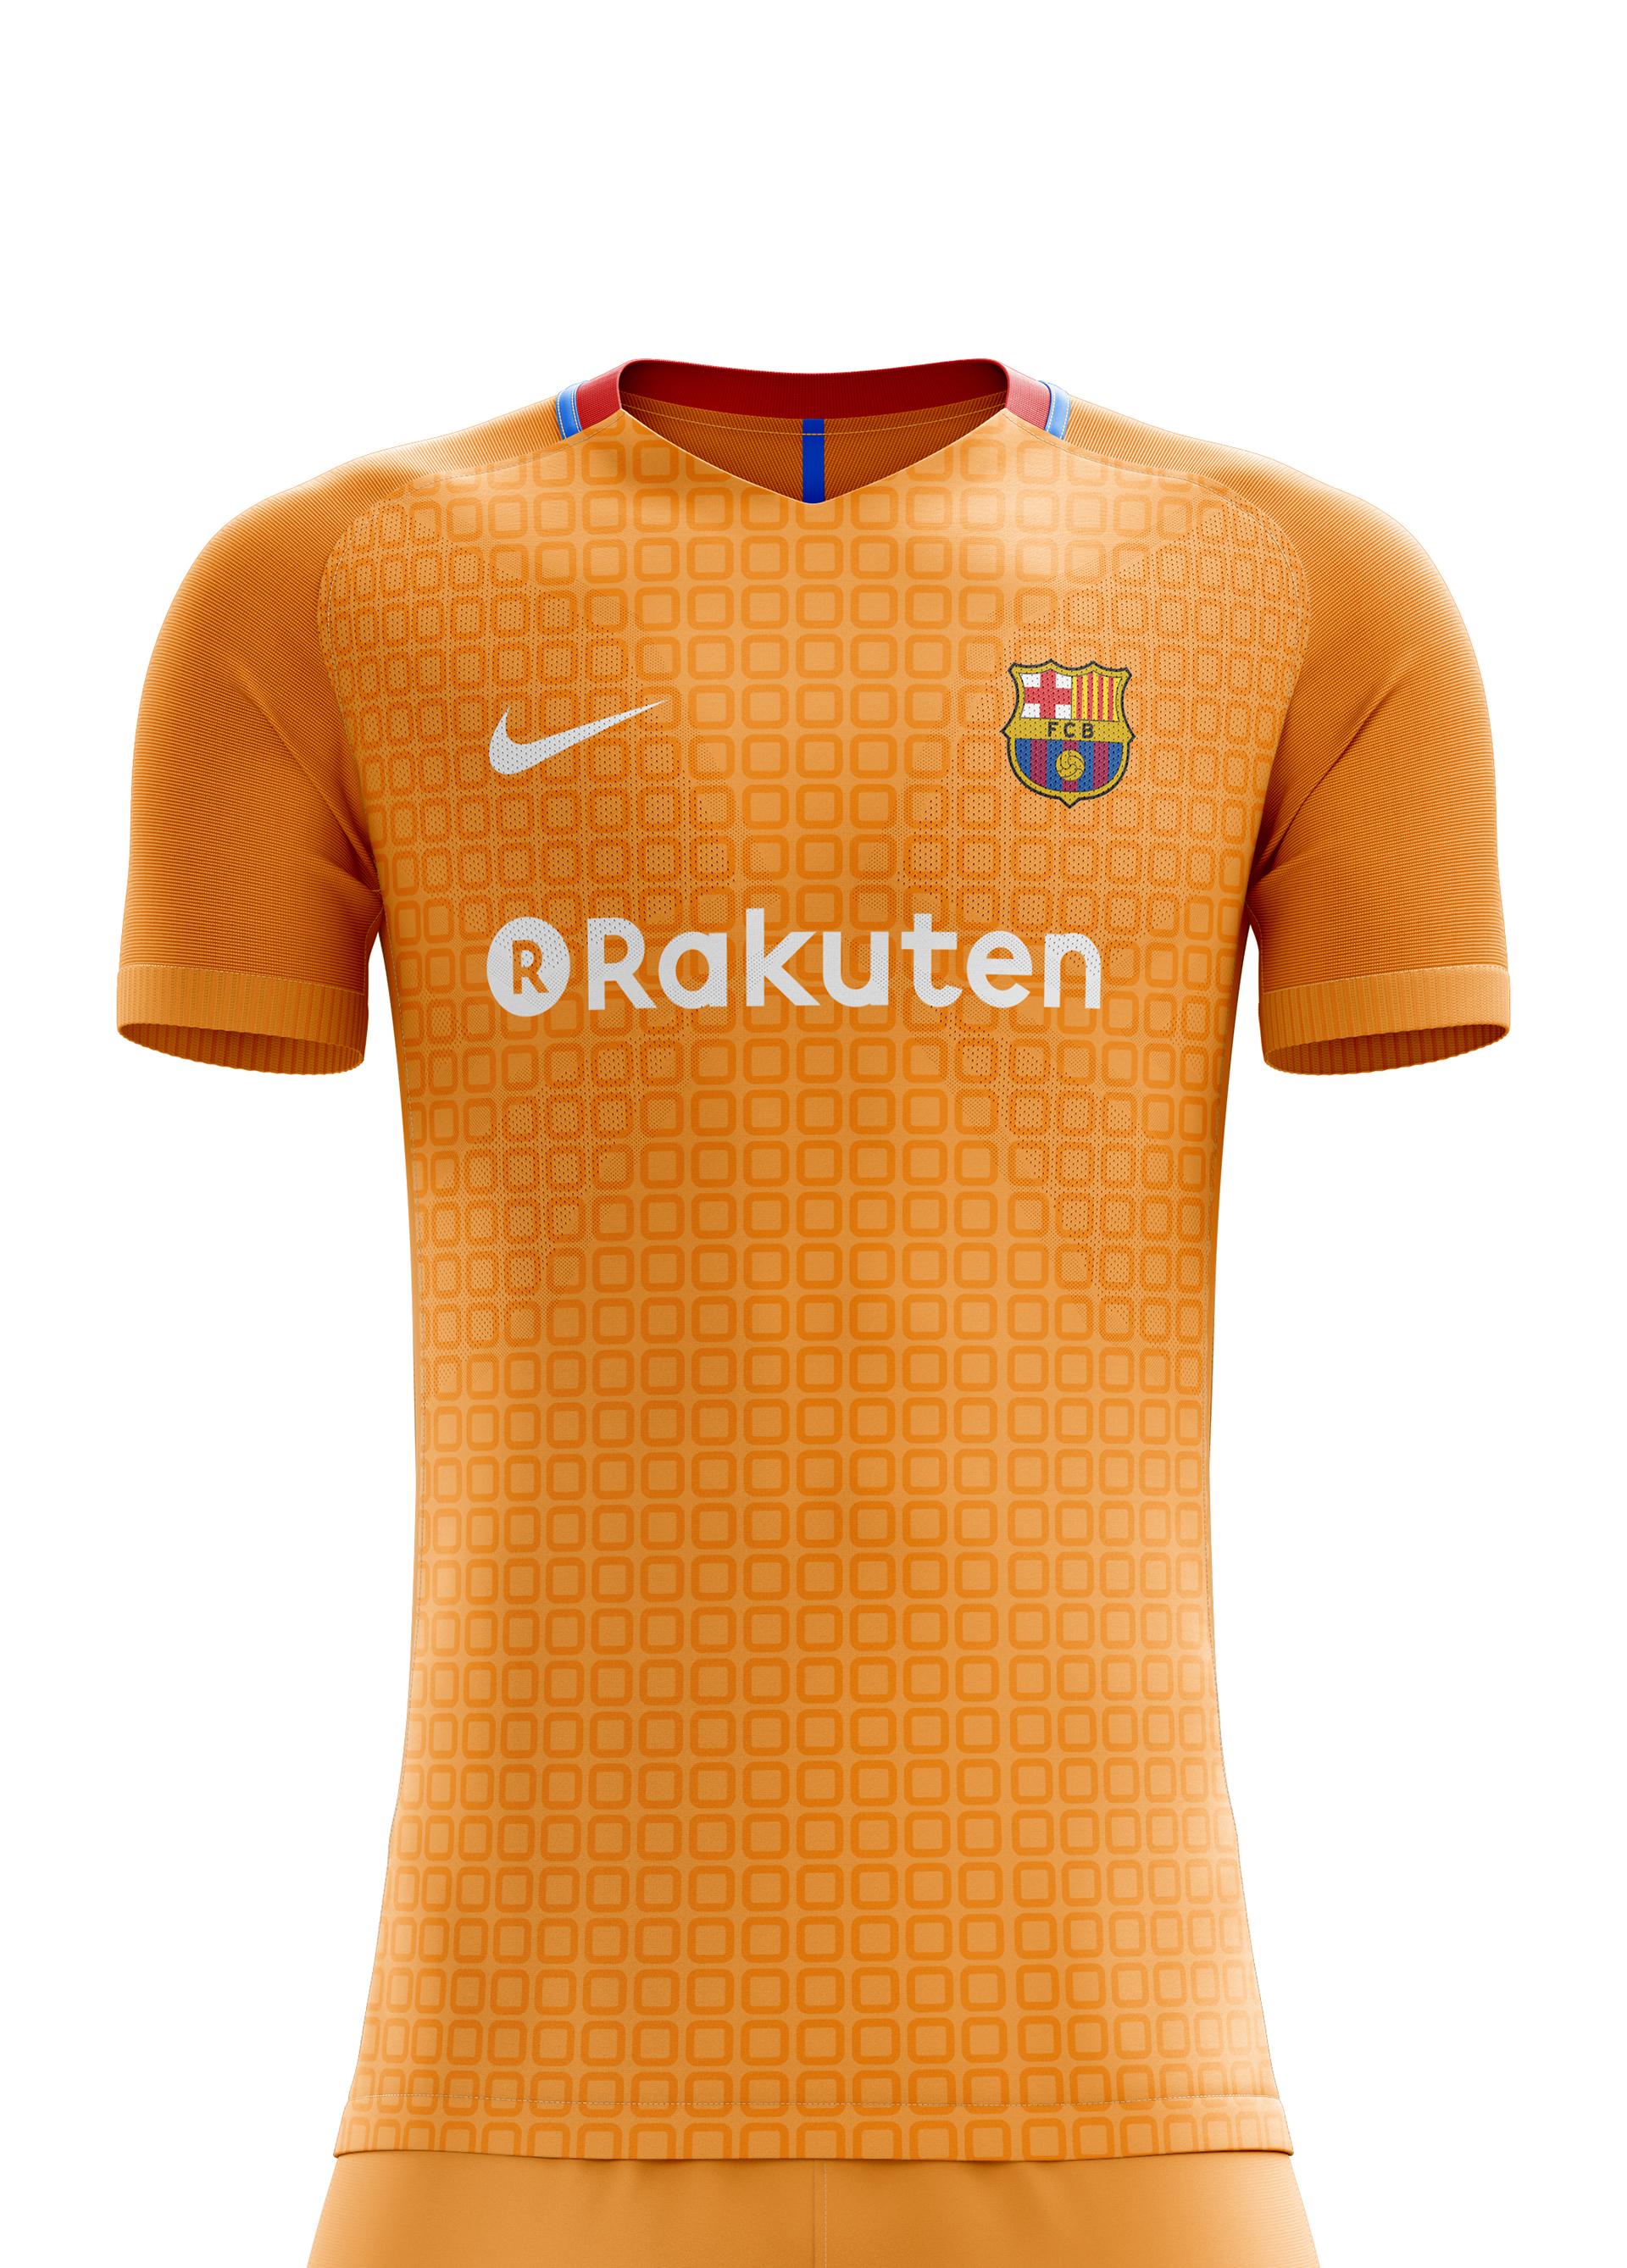 new products 191a3 4cc16 Fc Barcelona Football Kit 18/19. on Behance